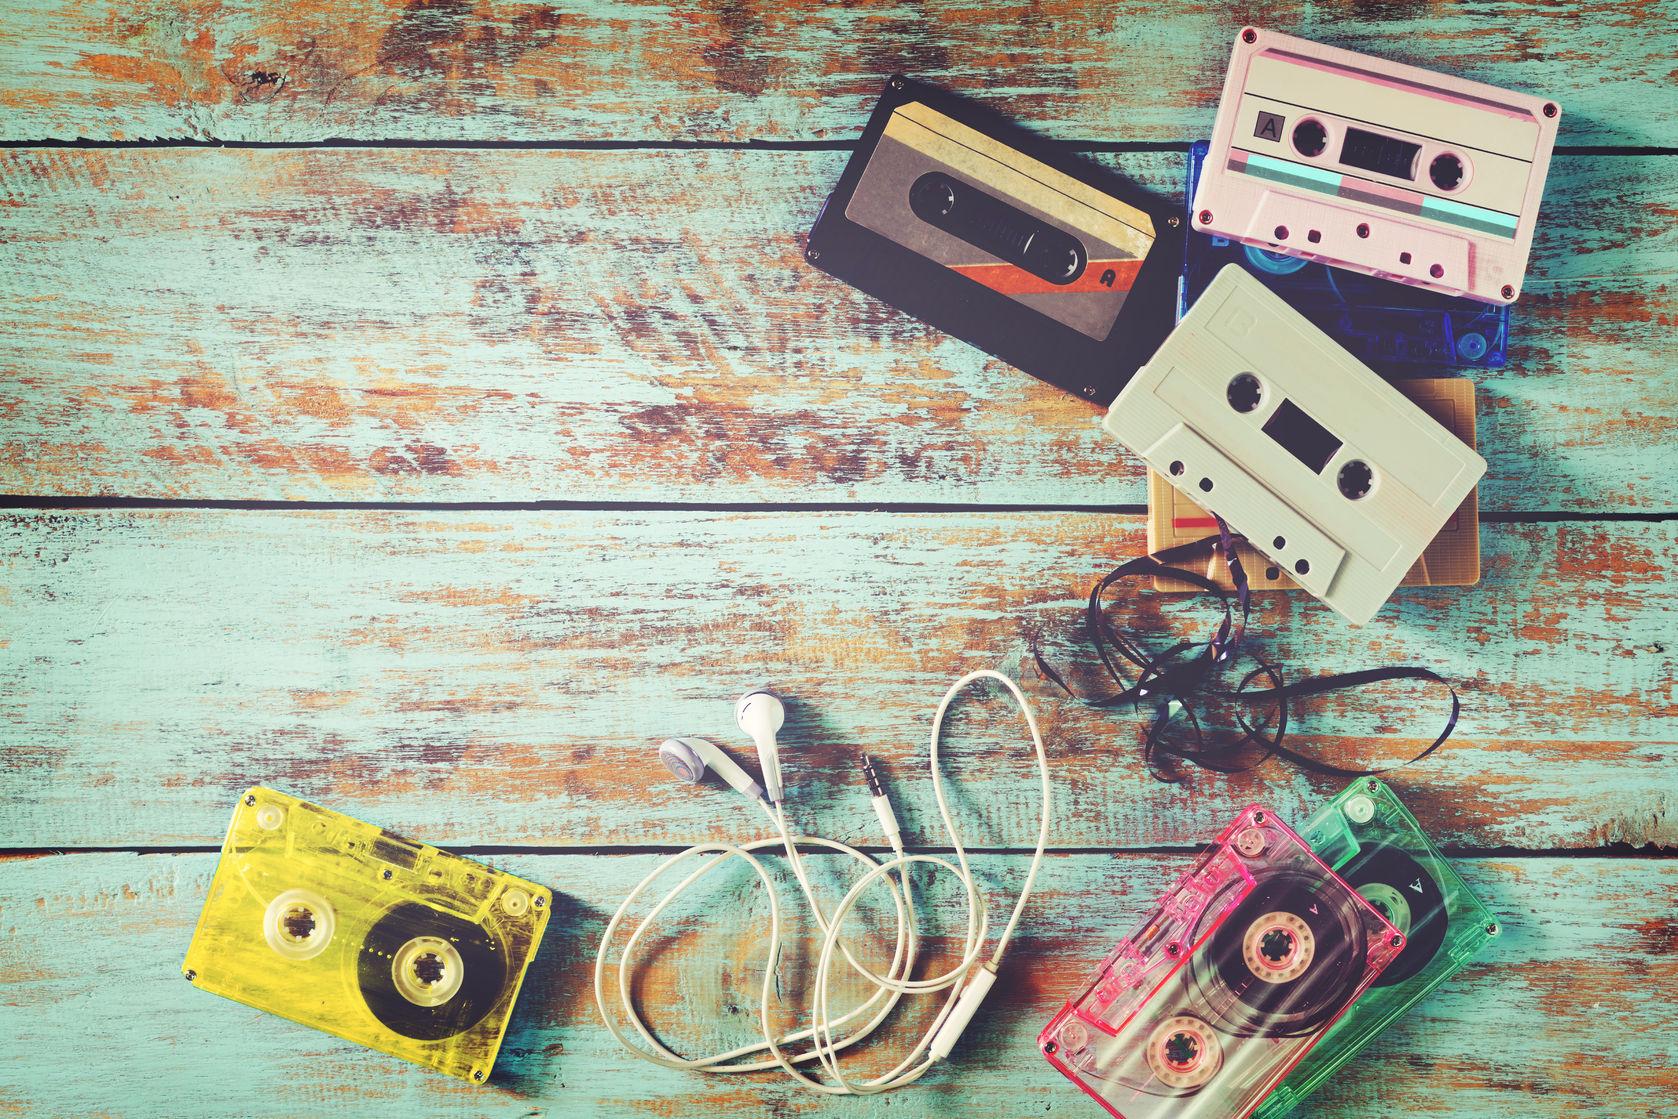 80er Party Ideen Tipps Zum Motto Bunt Frei Voller